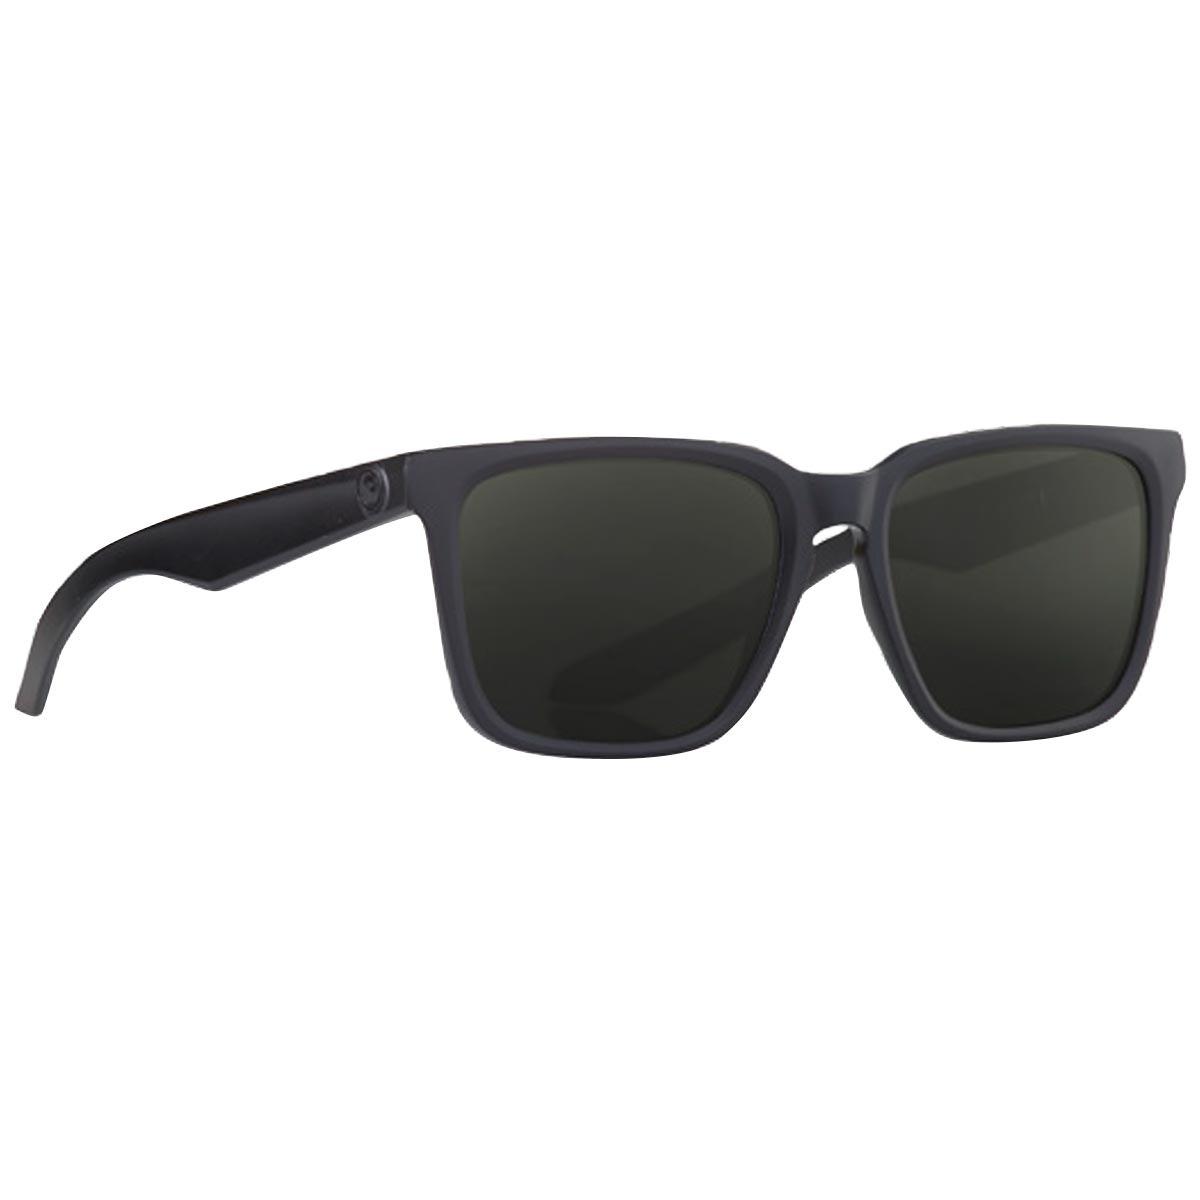 Óculos De Sol Dragon Baile - Matte black - R  660,00 em Mercado Livre 242a395ee3